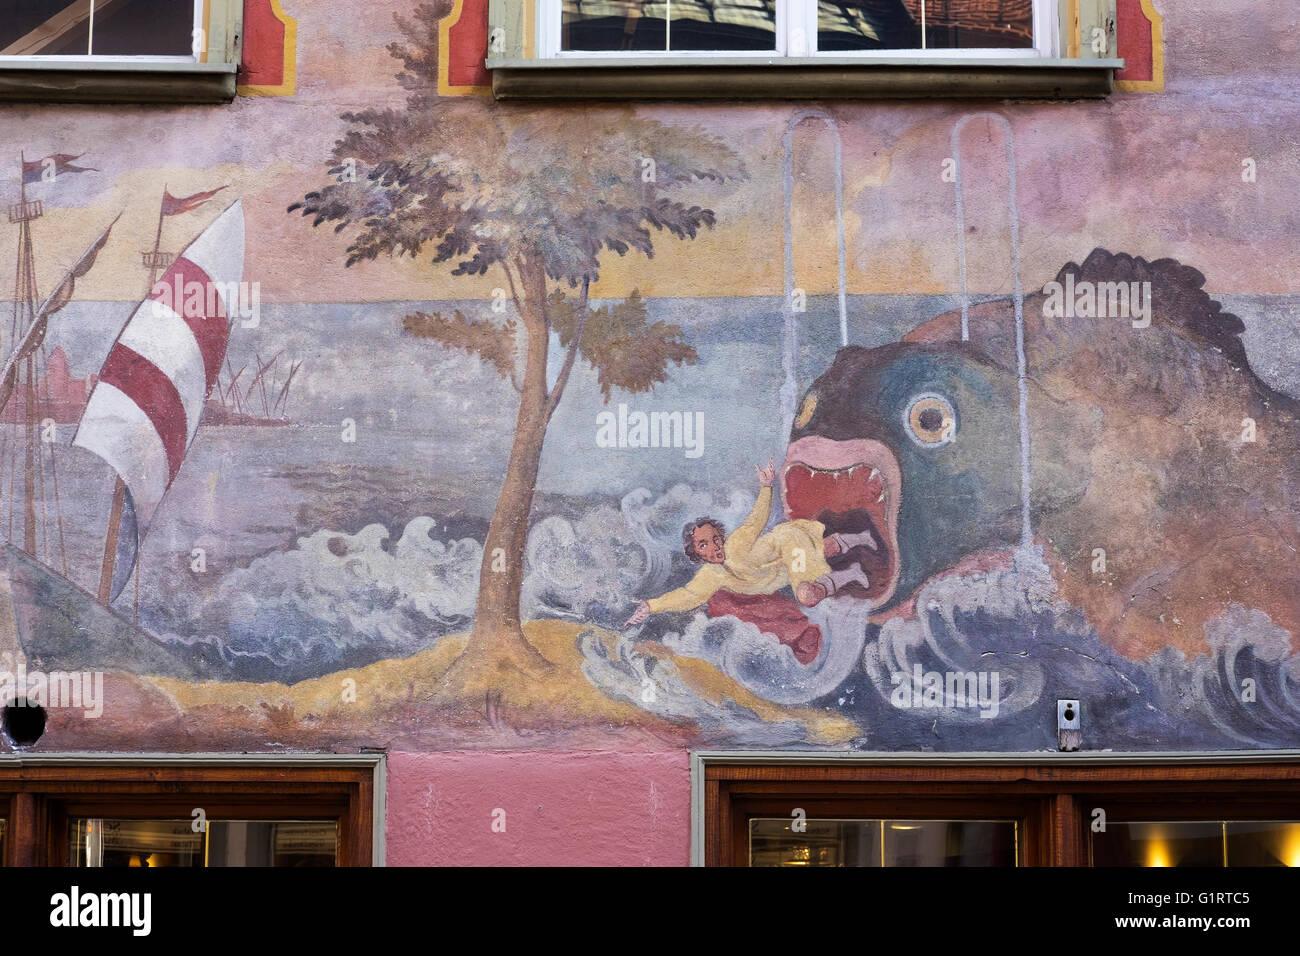 Fresco with the story of Jonah in the whale, whale cafe, Wangen in Allgäu, Westallgäu, Allgäu, Swabia, - Stock Image